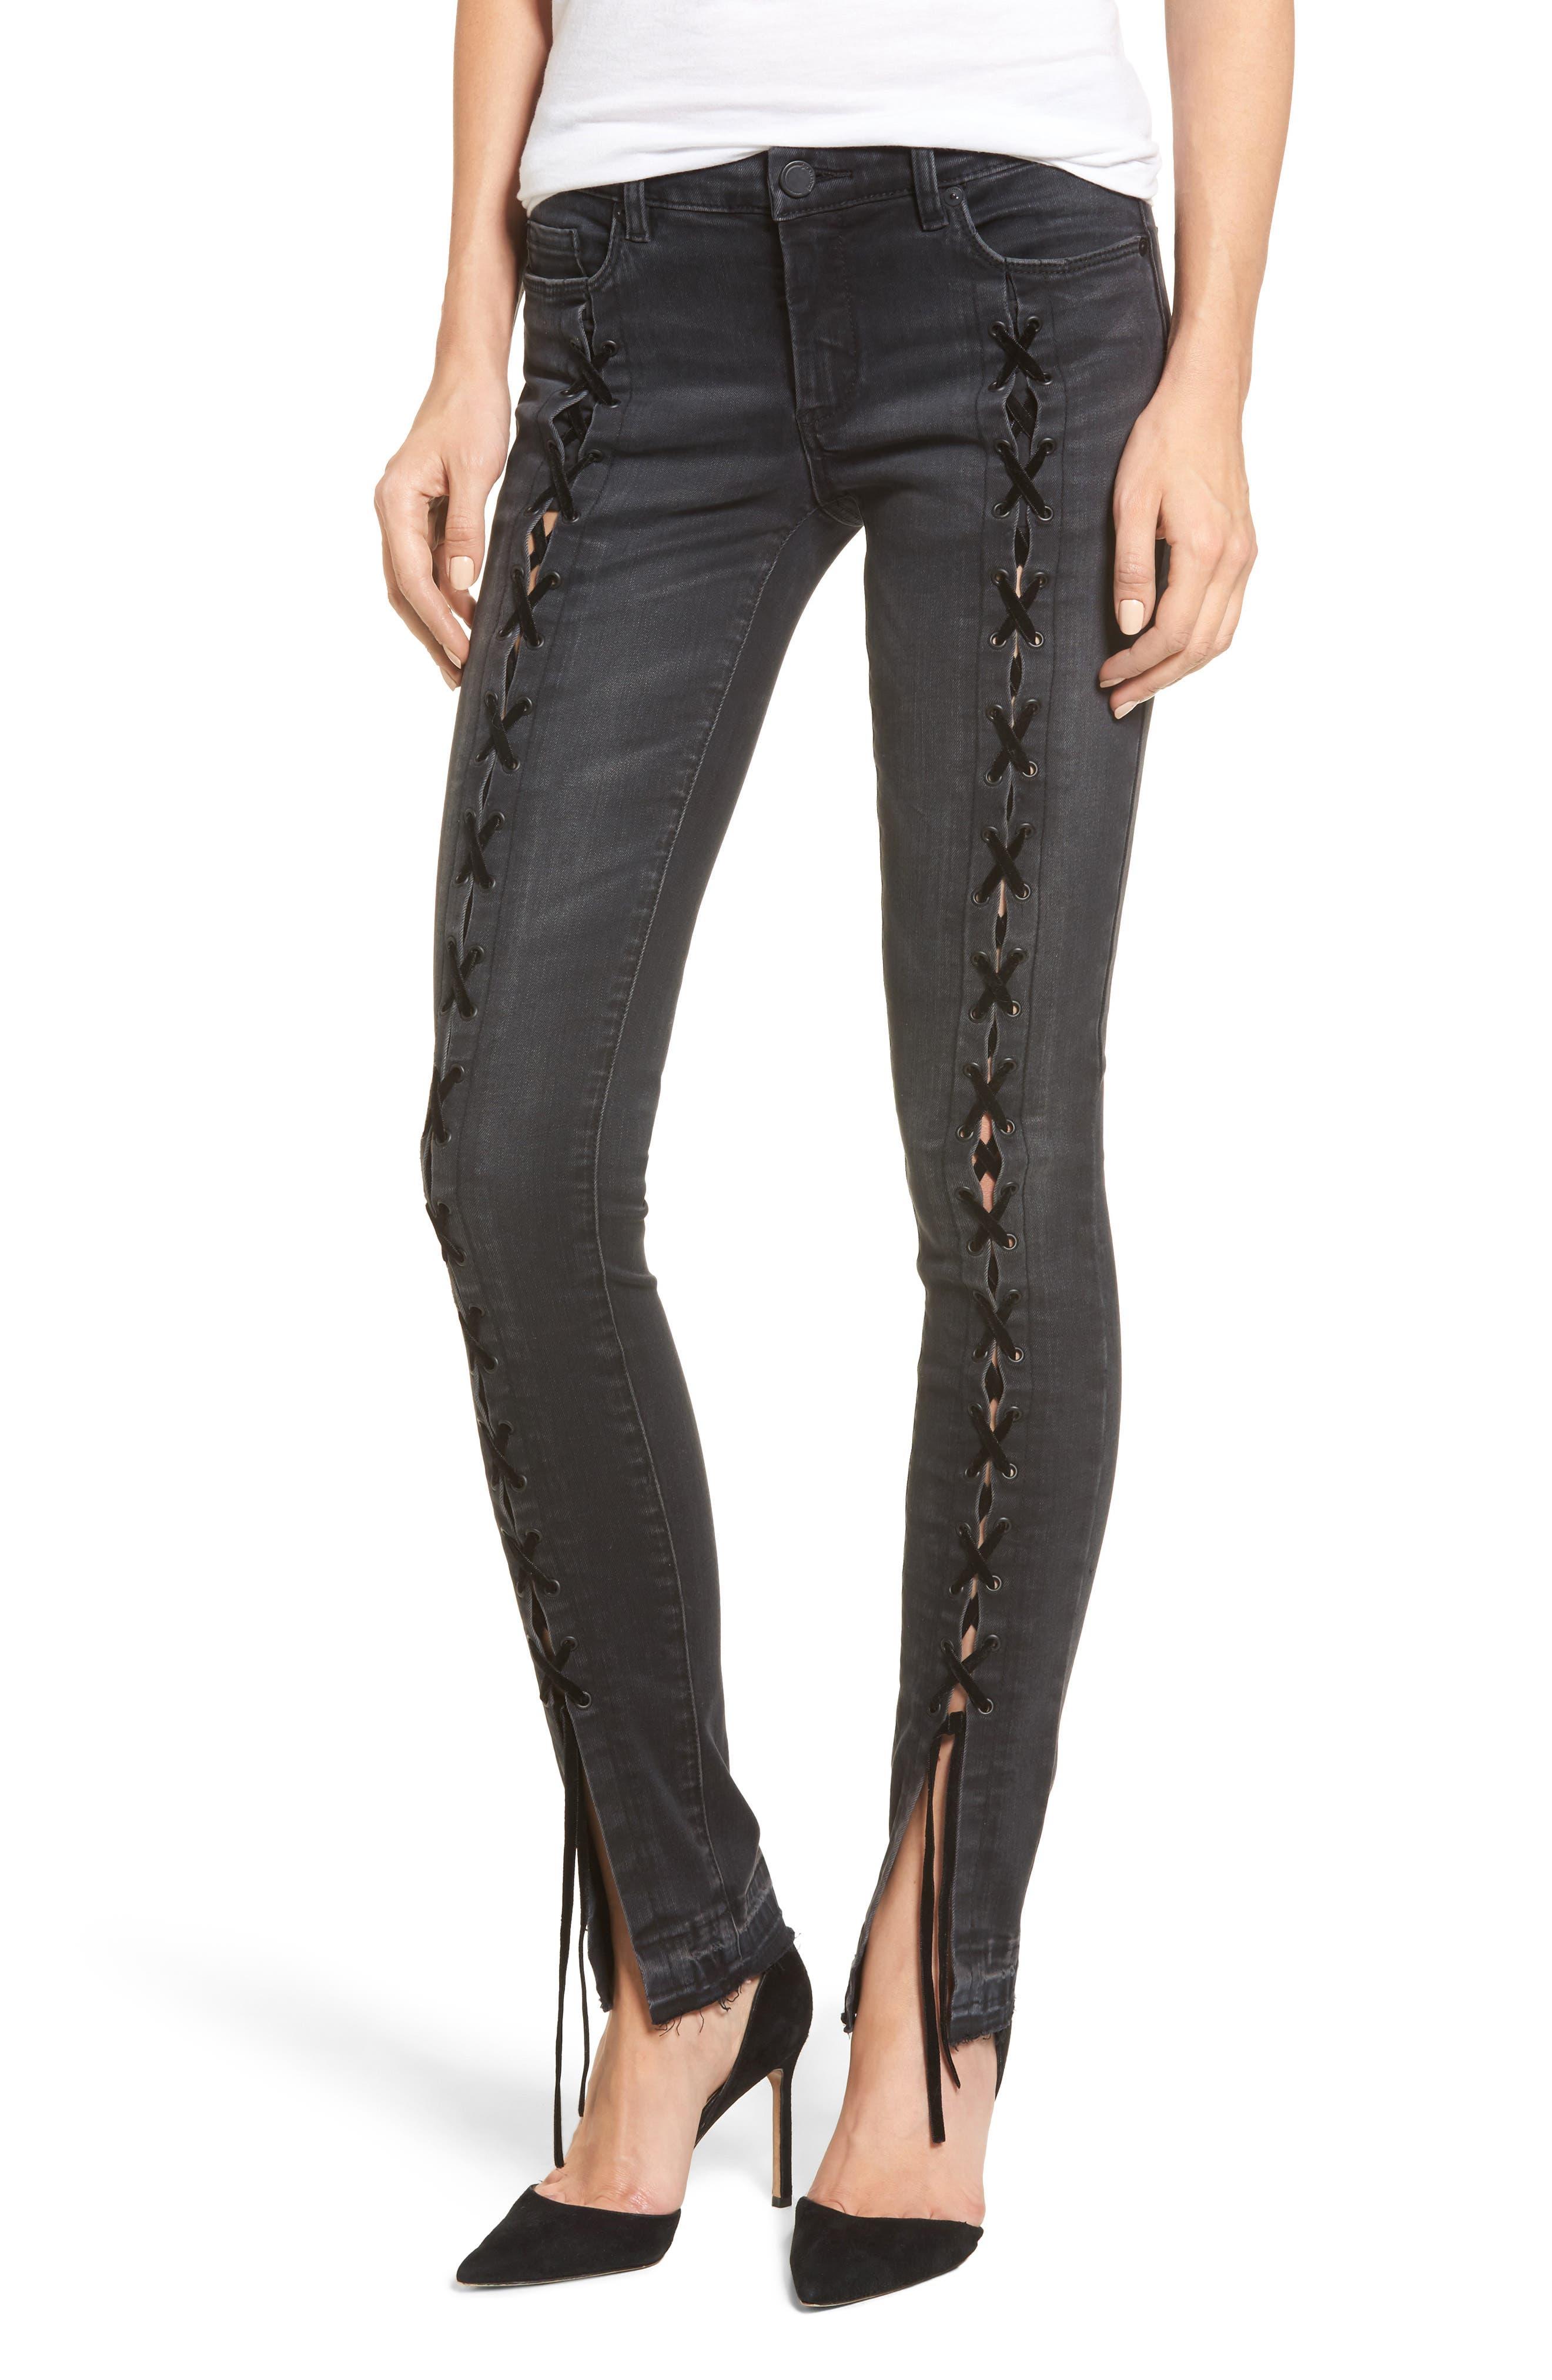 Main Image - BLANKNYC Crash Tactics Lace Up Skinny Jeans